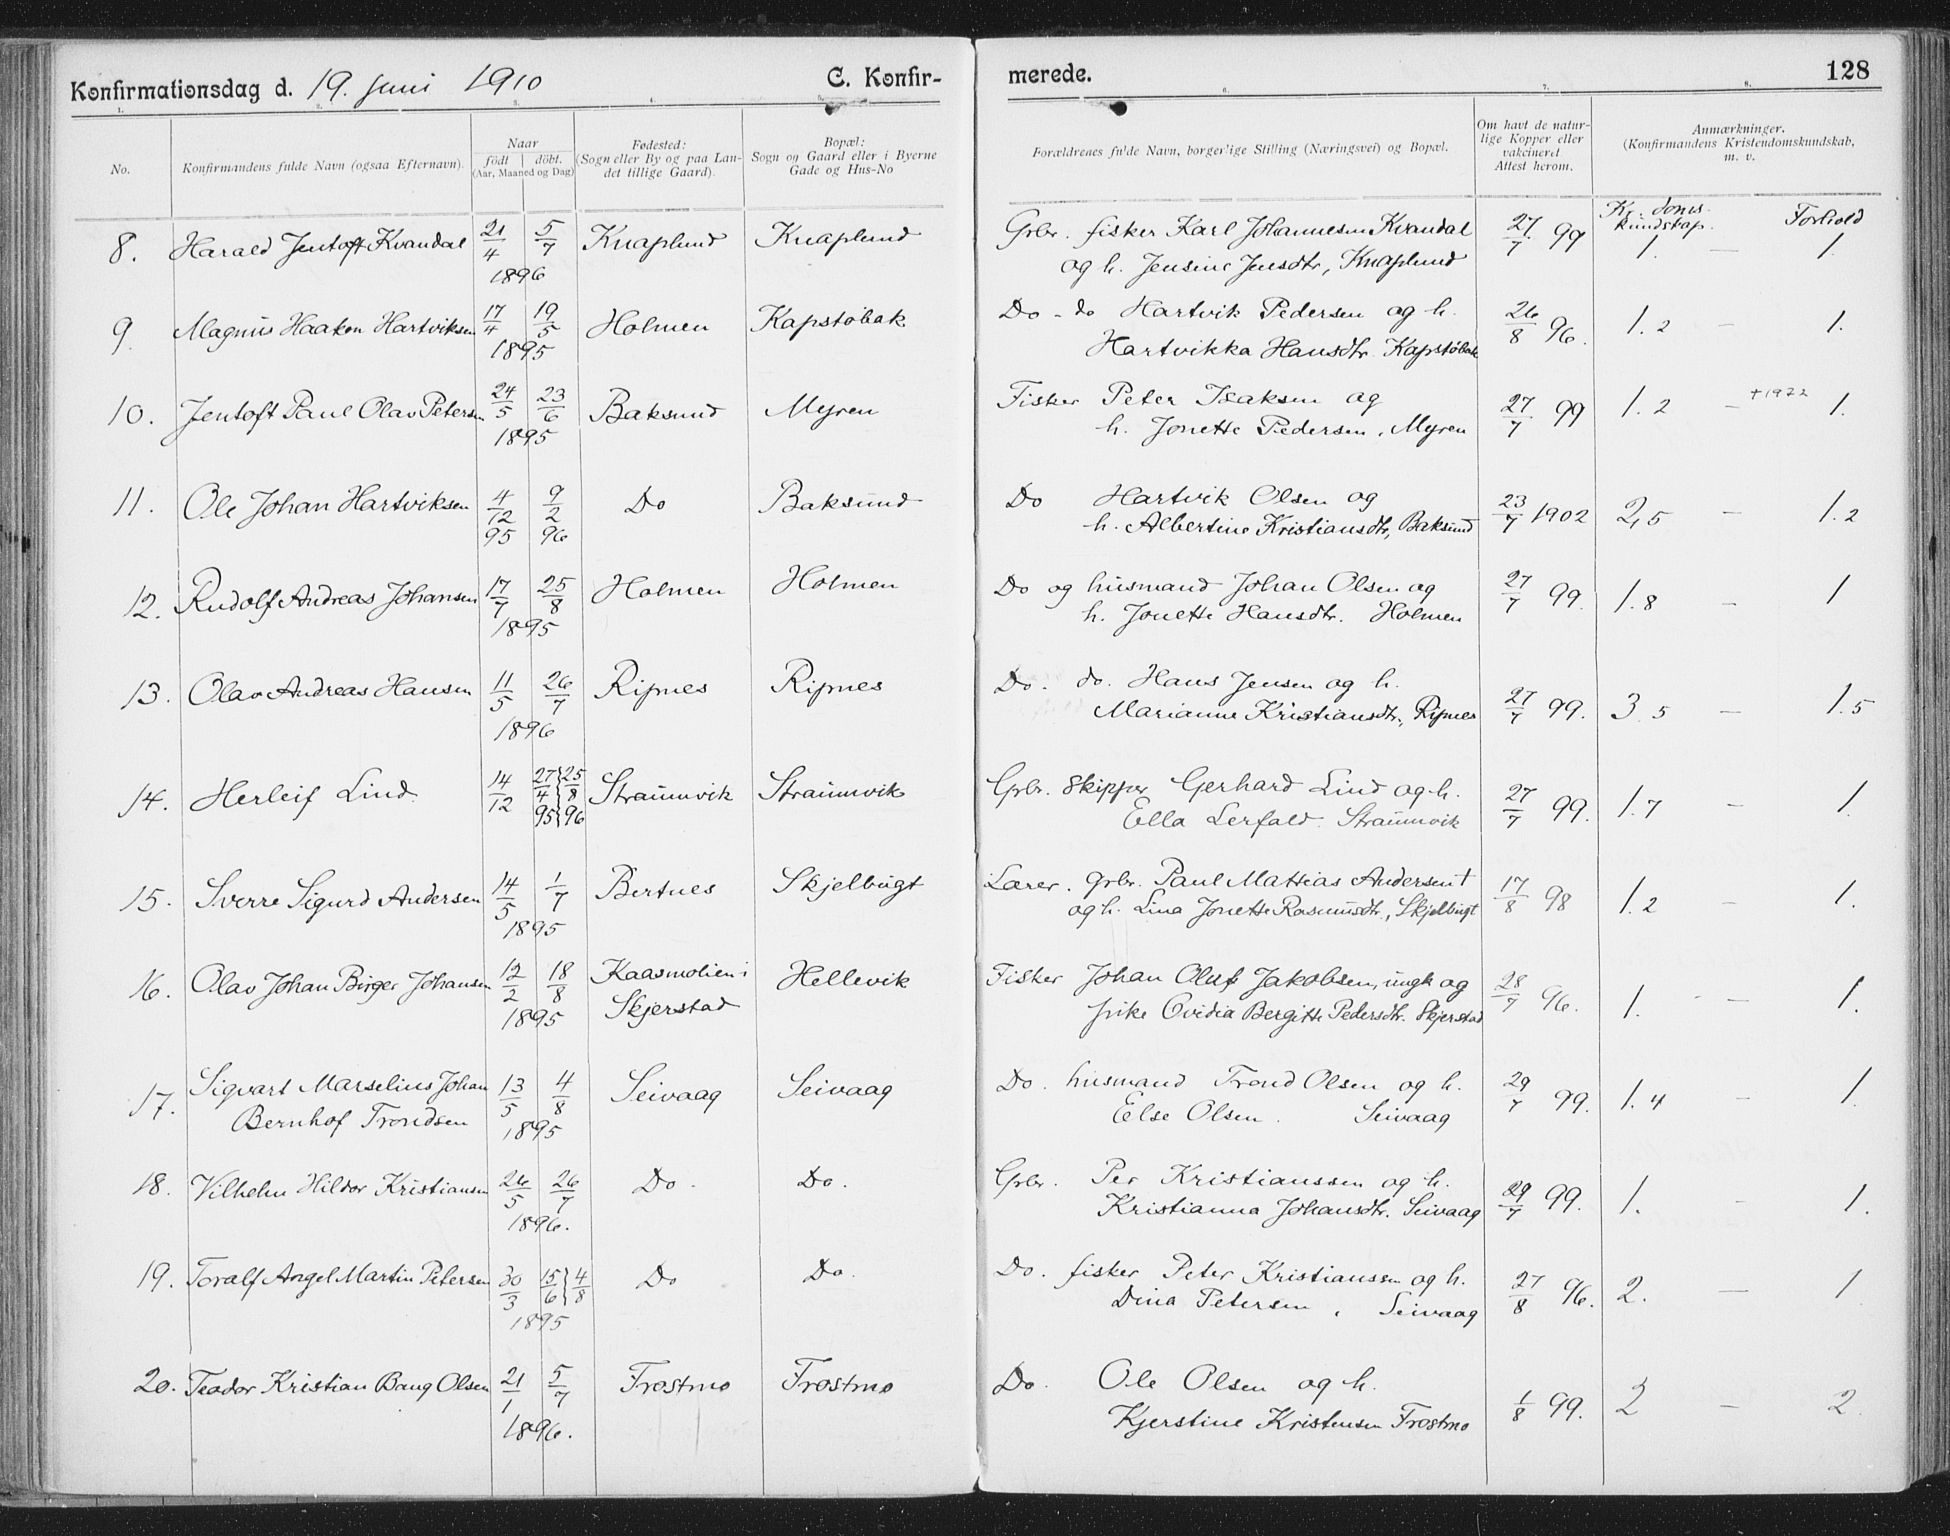 SAT, Ministerialprotokoller, klokkerbøker og fødselsregistre - Nordland, 804/L0081: Ministerialbok nr. 804A02, 1901-1915, s. 128